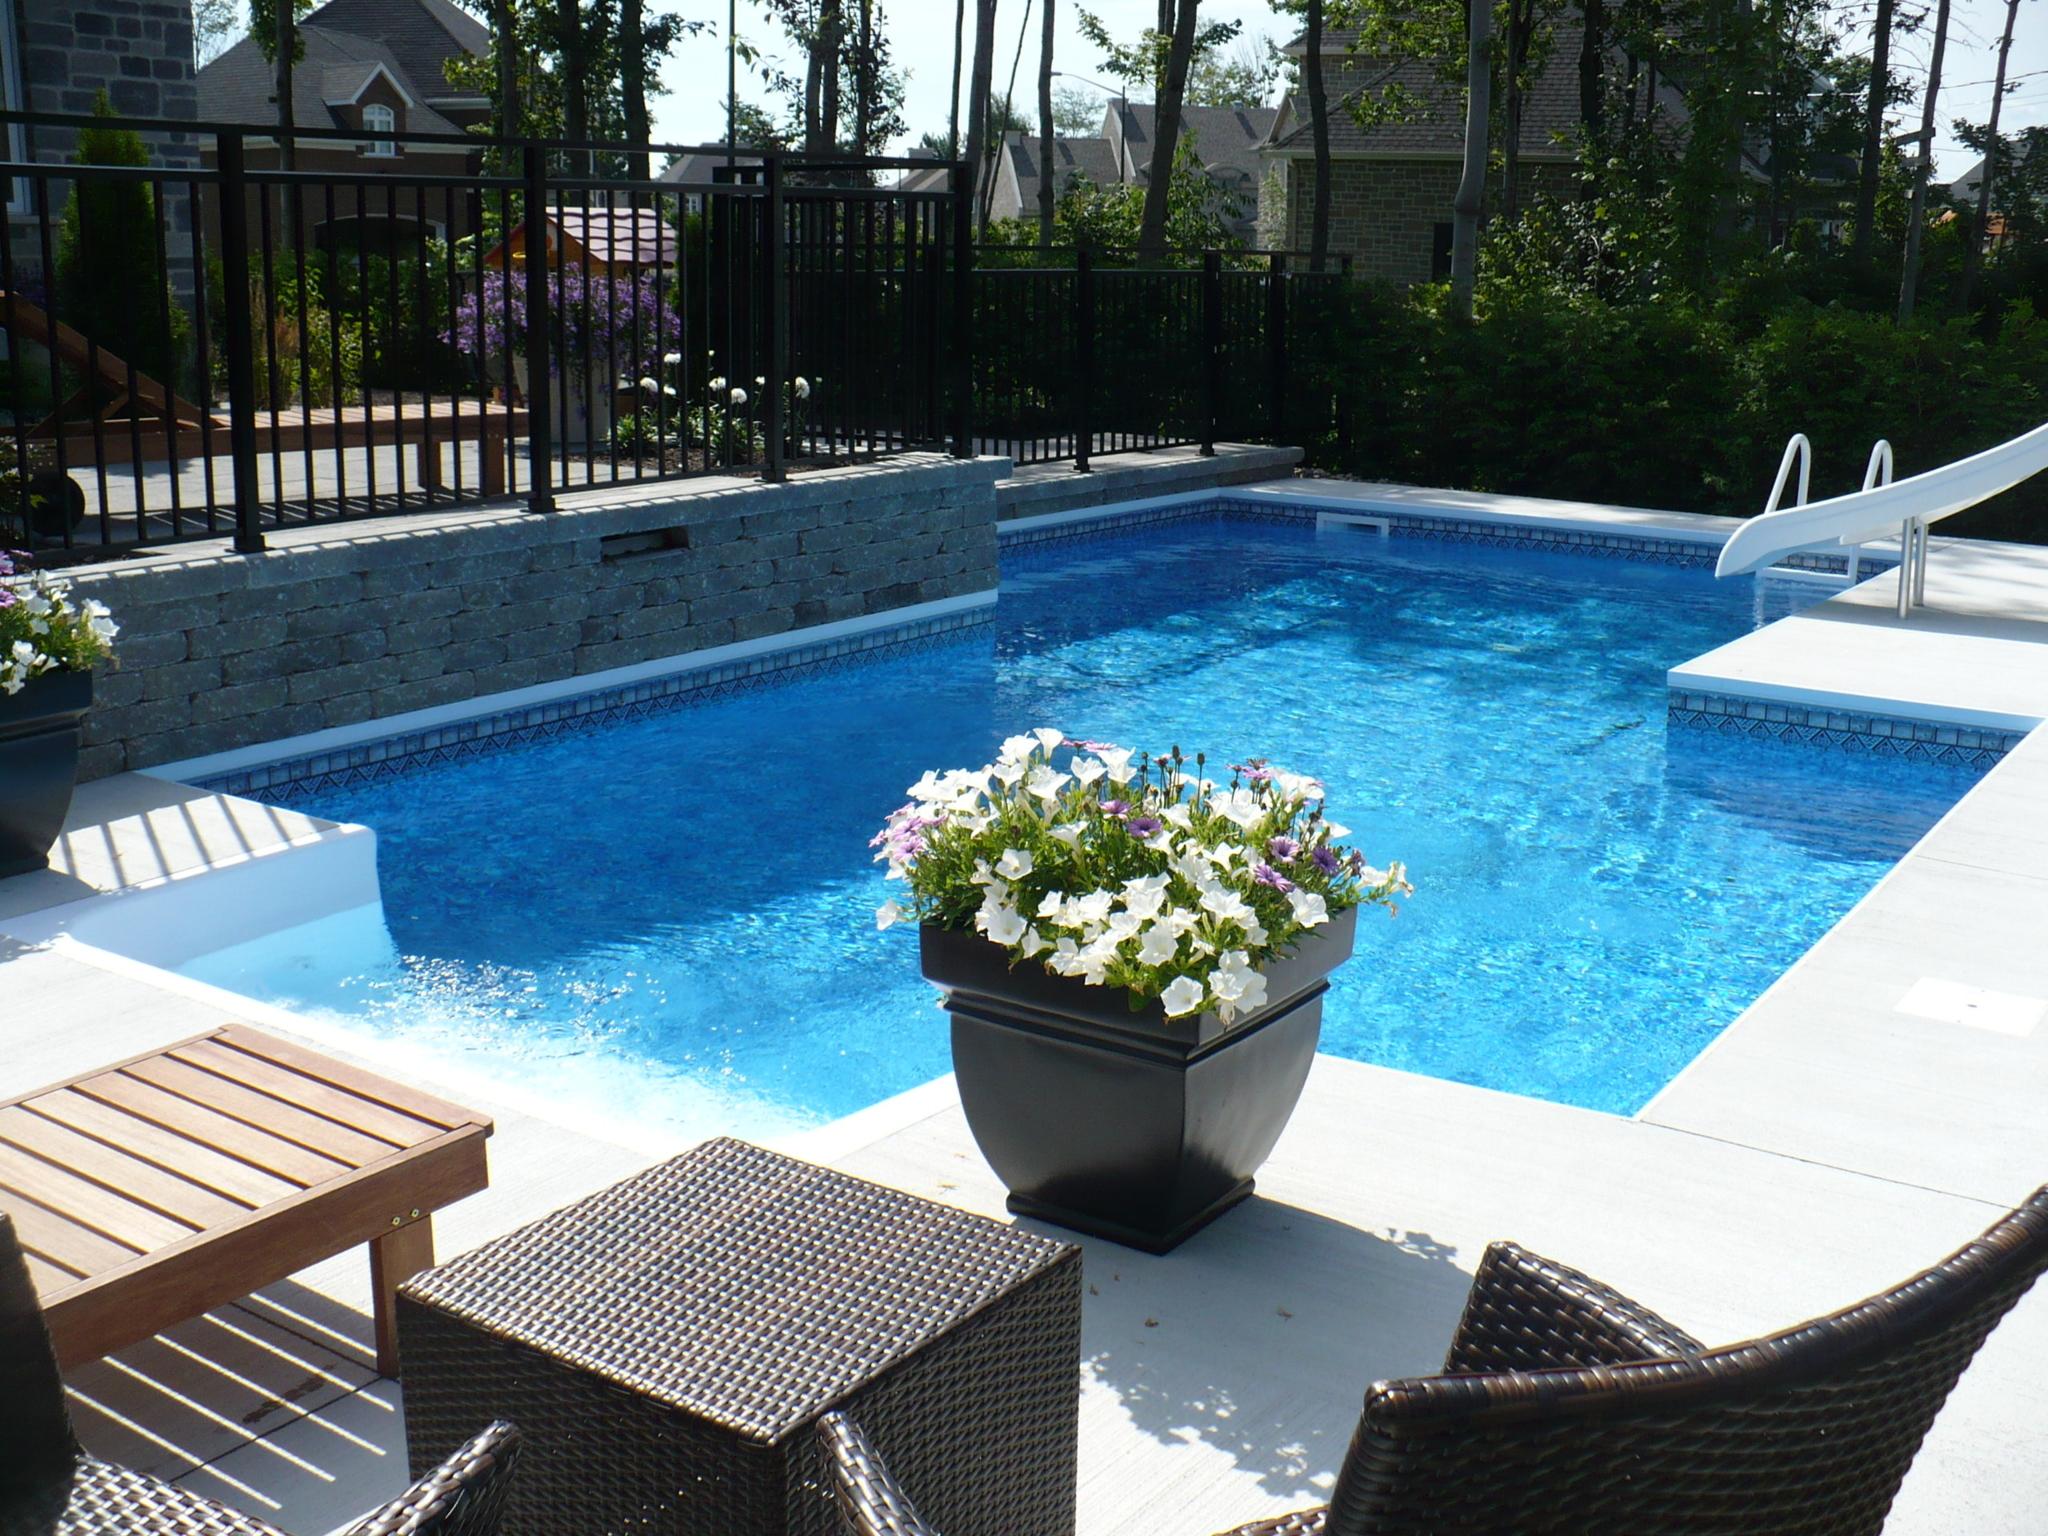 concept piscine design enr qu bec qc ourbis